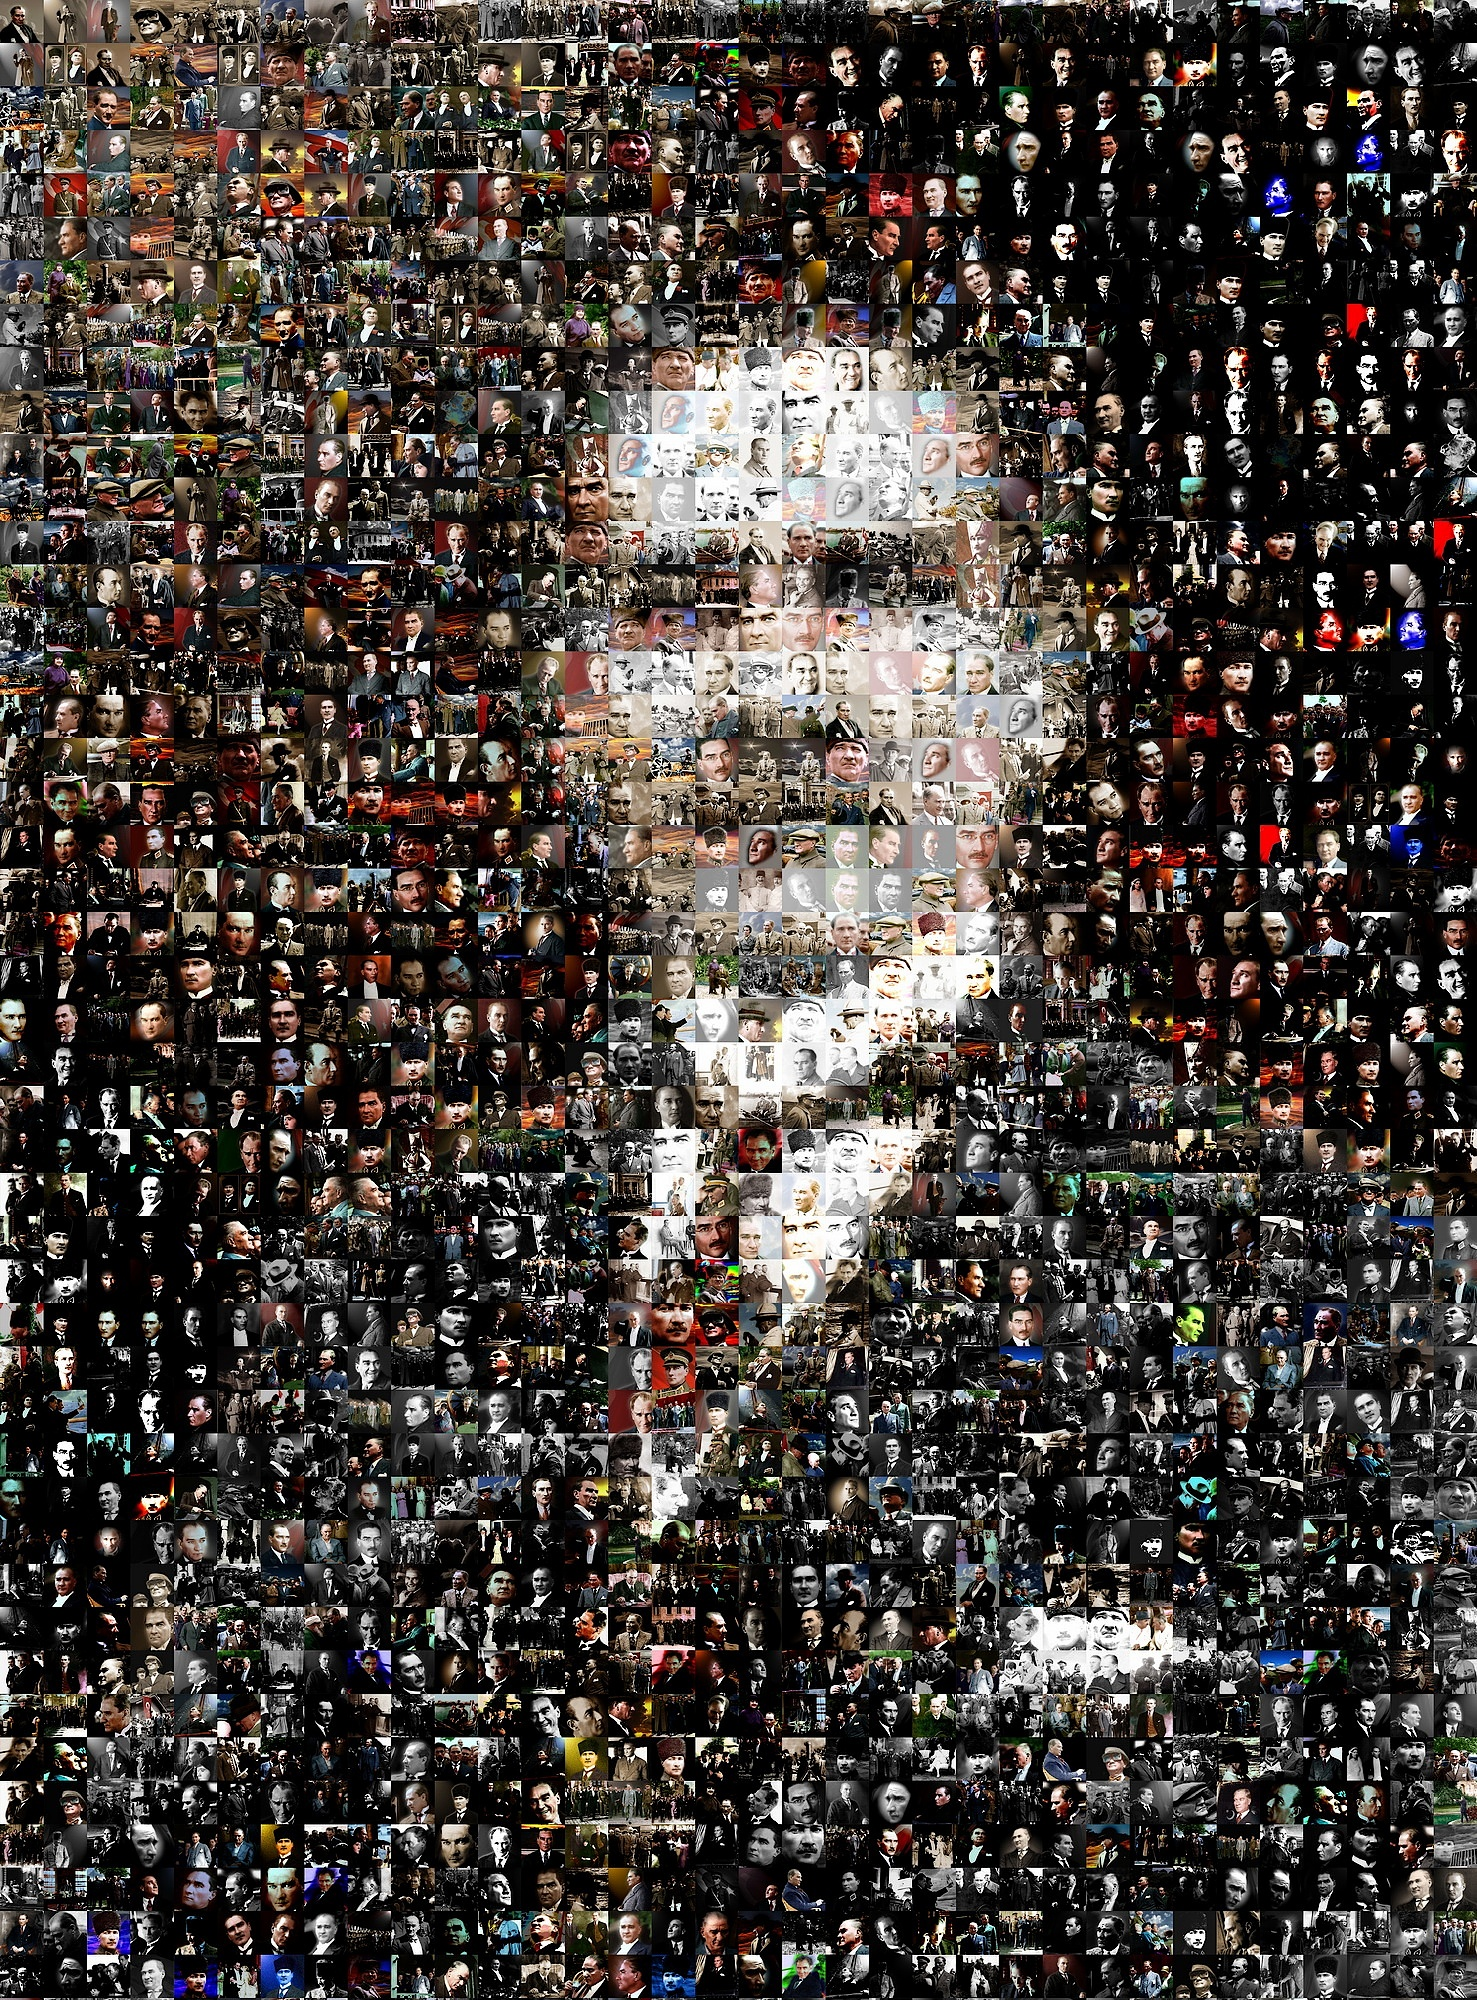 Ataturk_set_0002.jpg